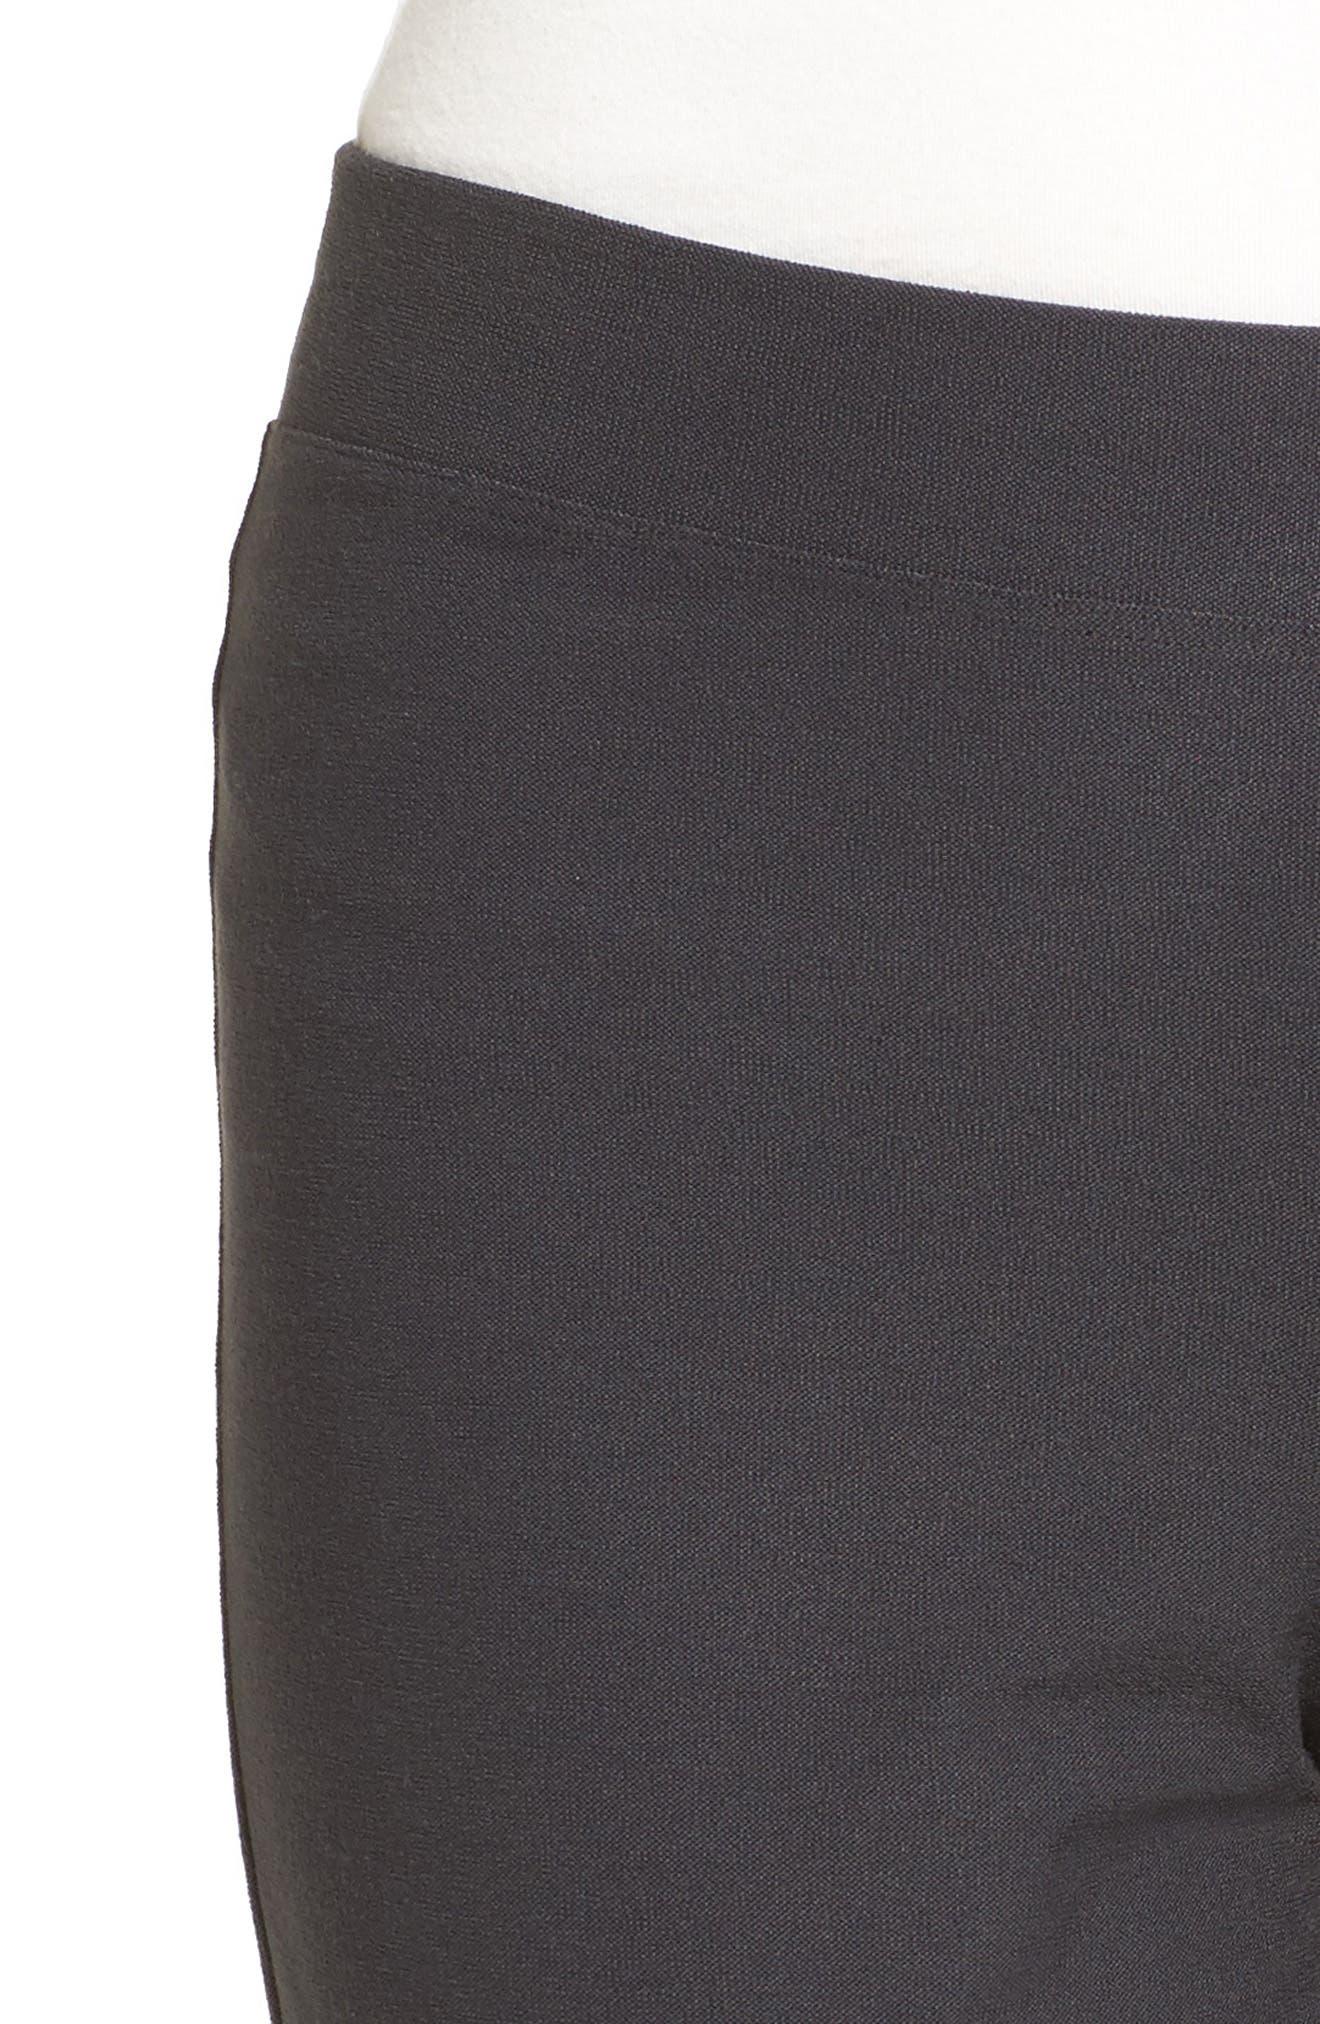 Stretch Crepe Slim Ankle Pants,                             Alternate thumbnail 60, color,